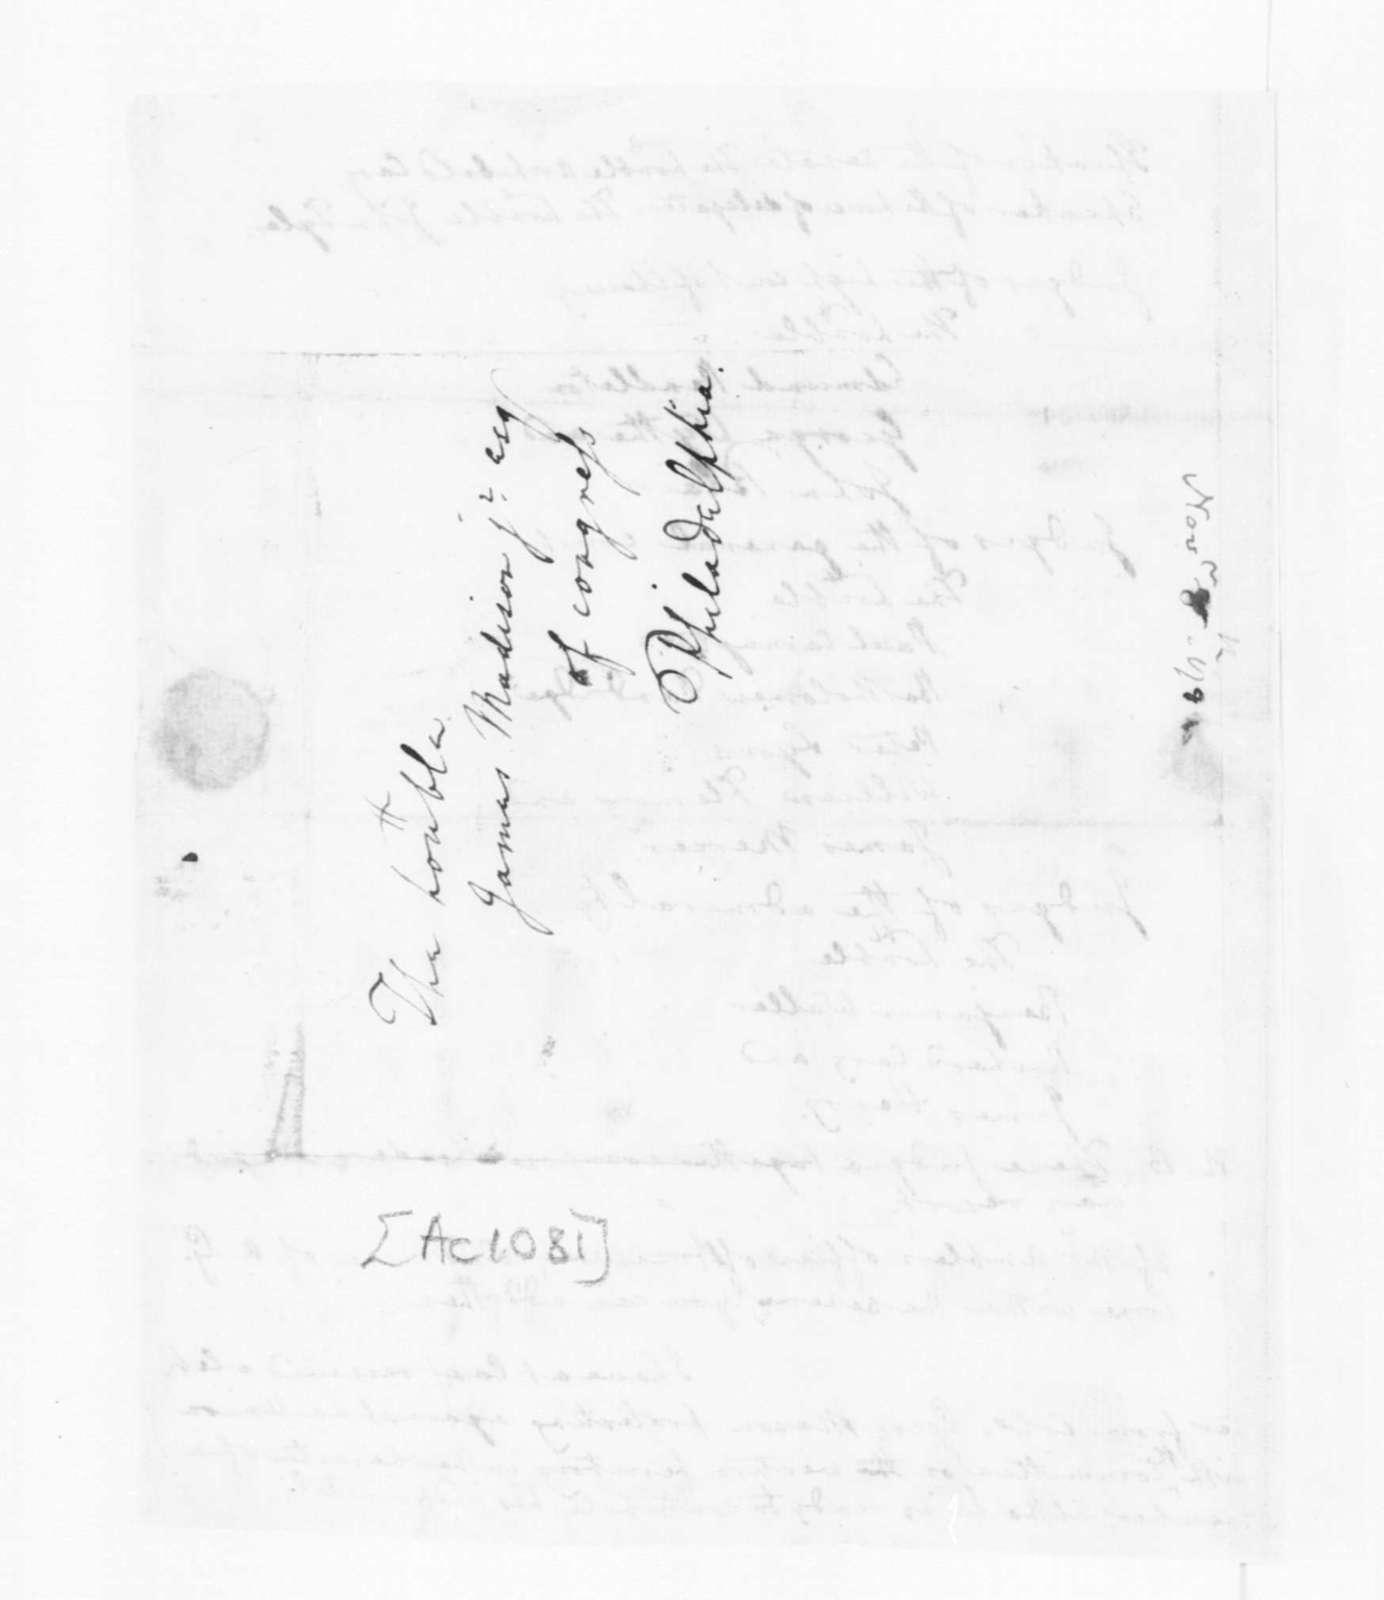 Edmund Randolph to James Madison, November 8, 1782.